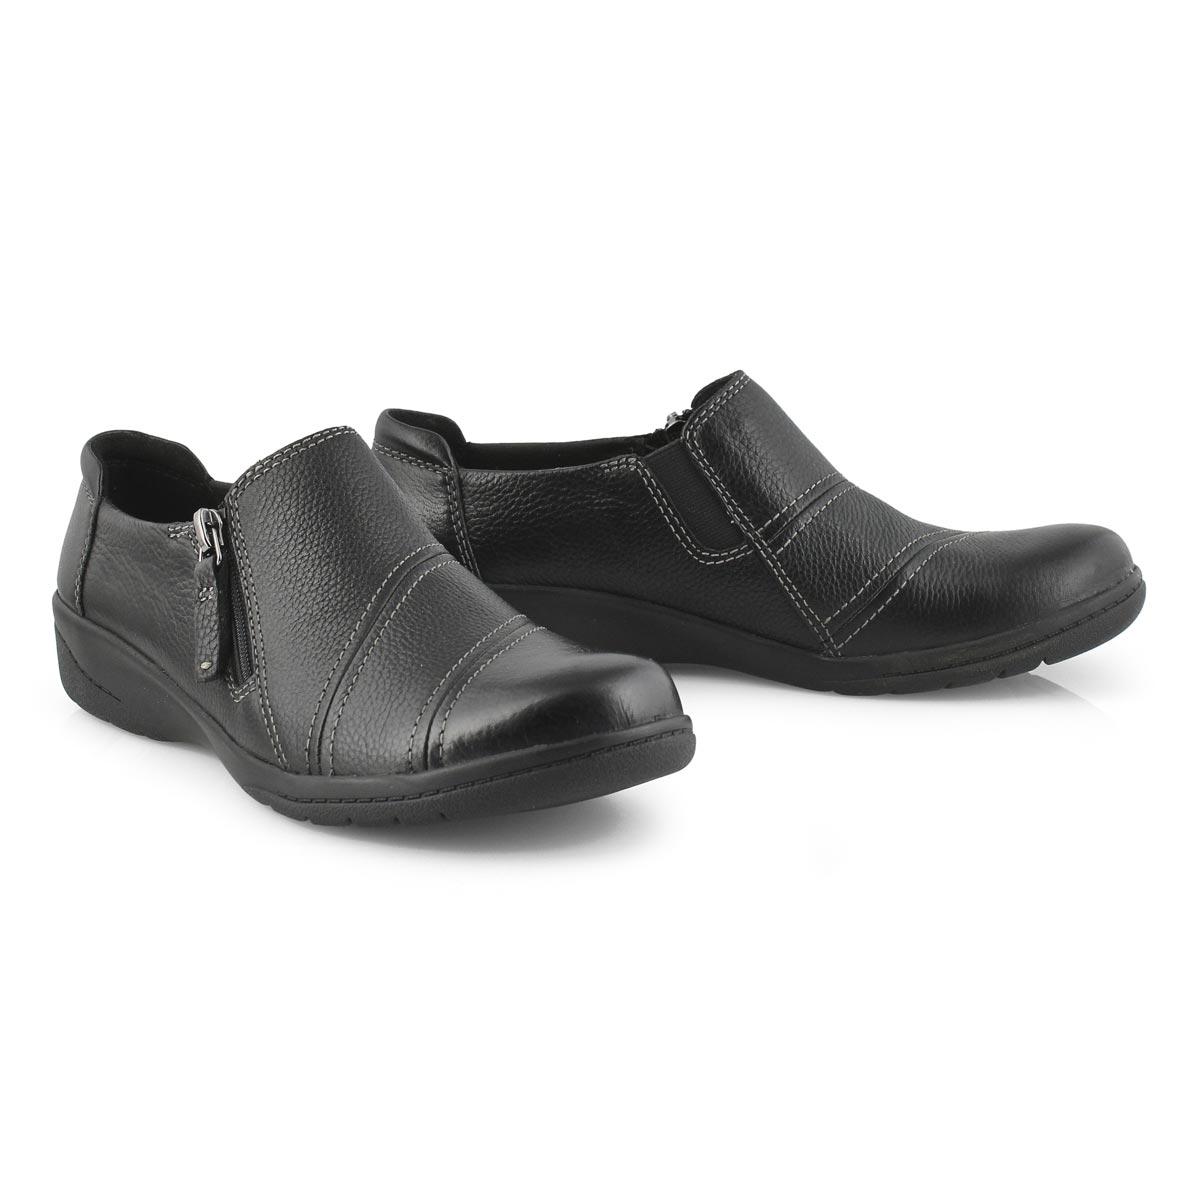 Lds Cheyn Clay black casual slip on